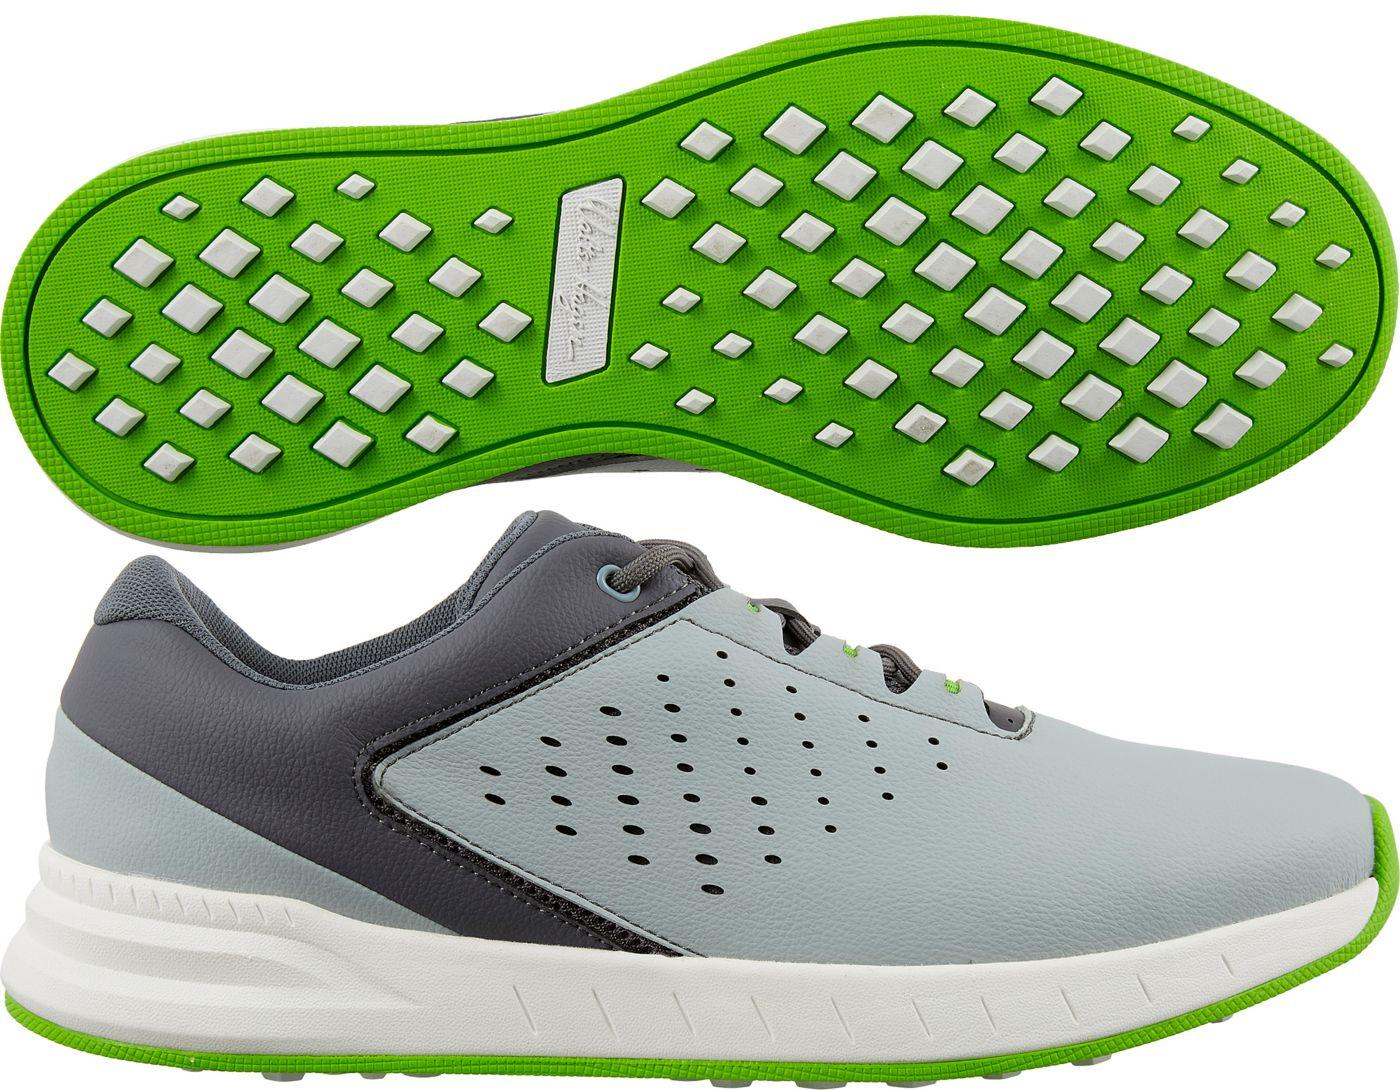 Walter Hagen Men's 2020 Course Casual Golf Shoes